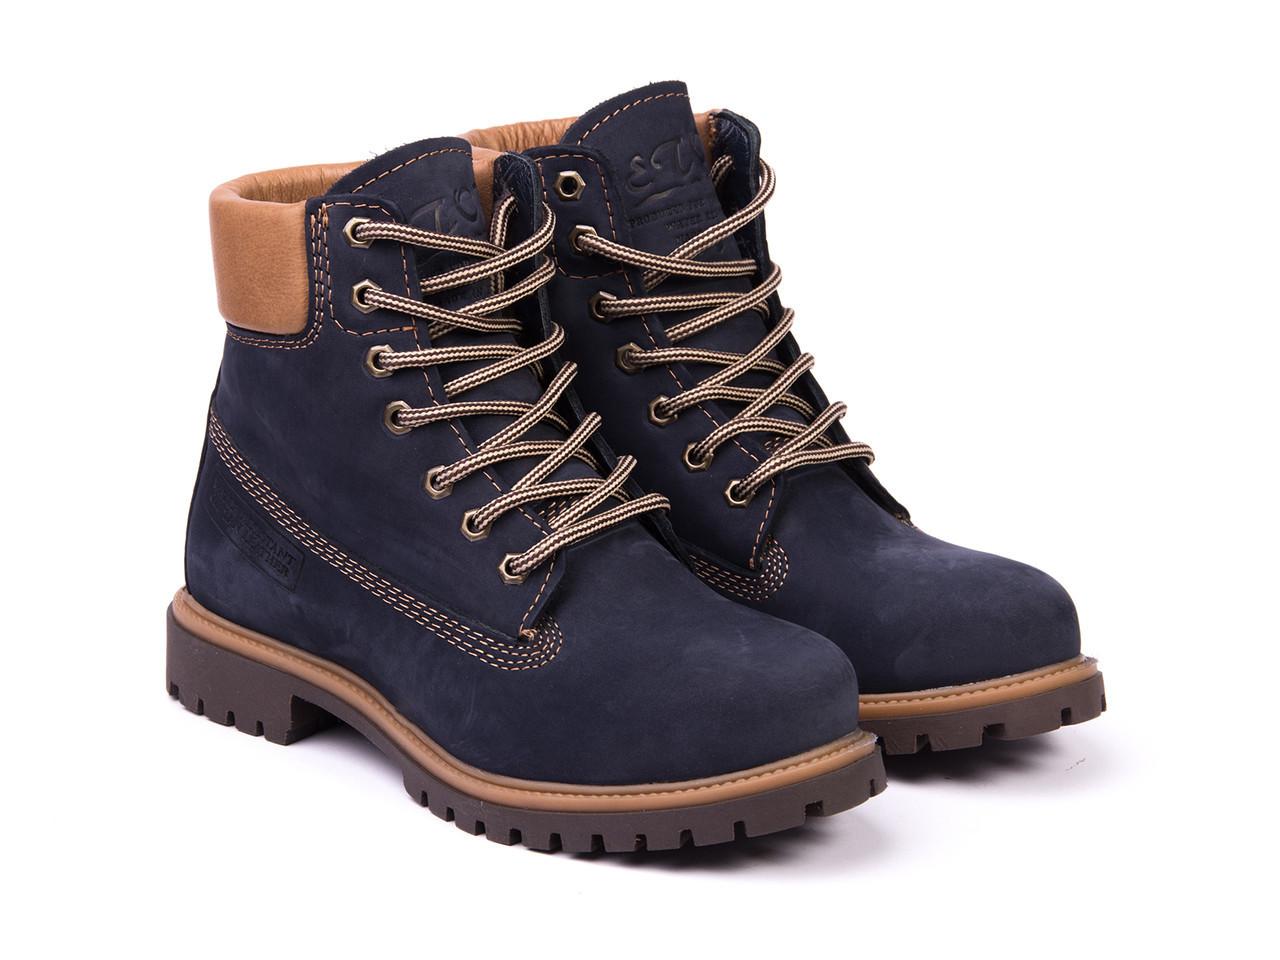 Ботинки Etor 9916-2298 41 синие